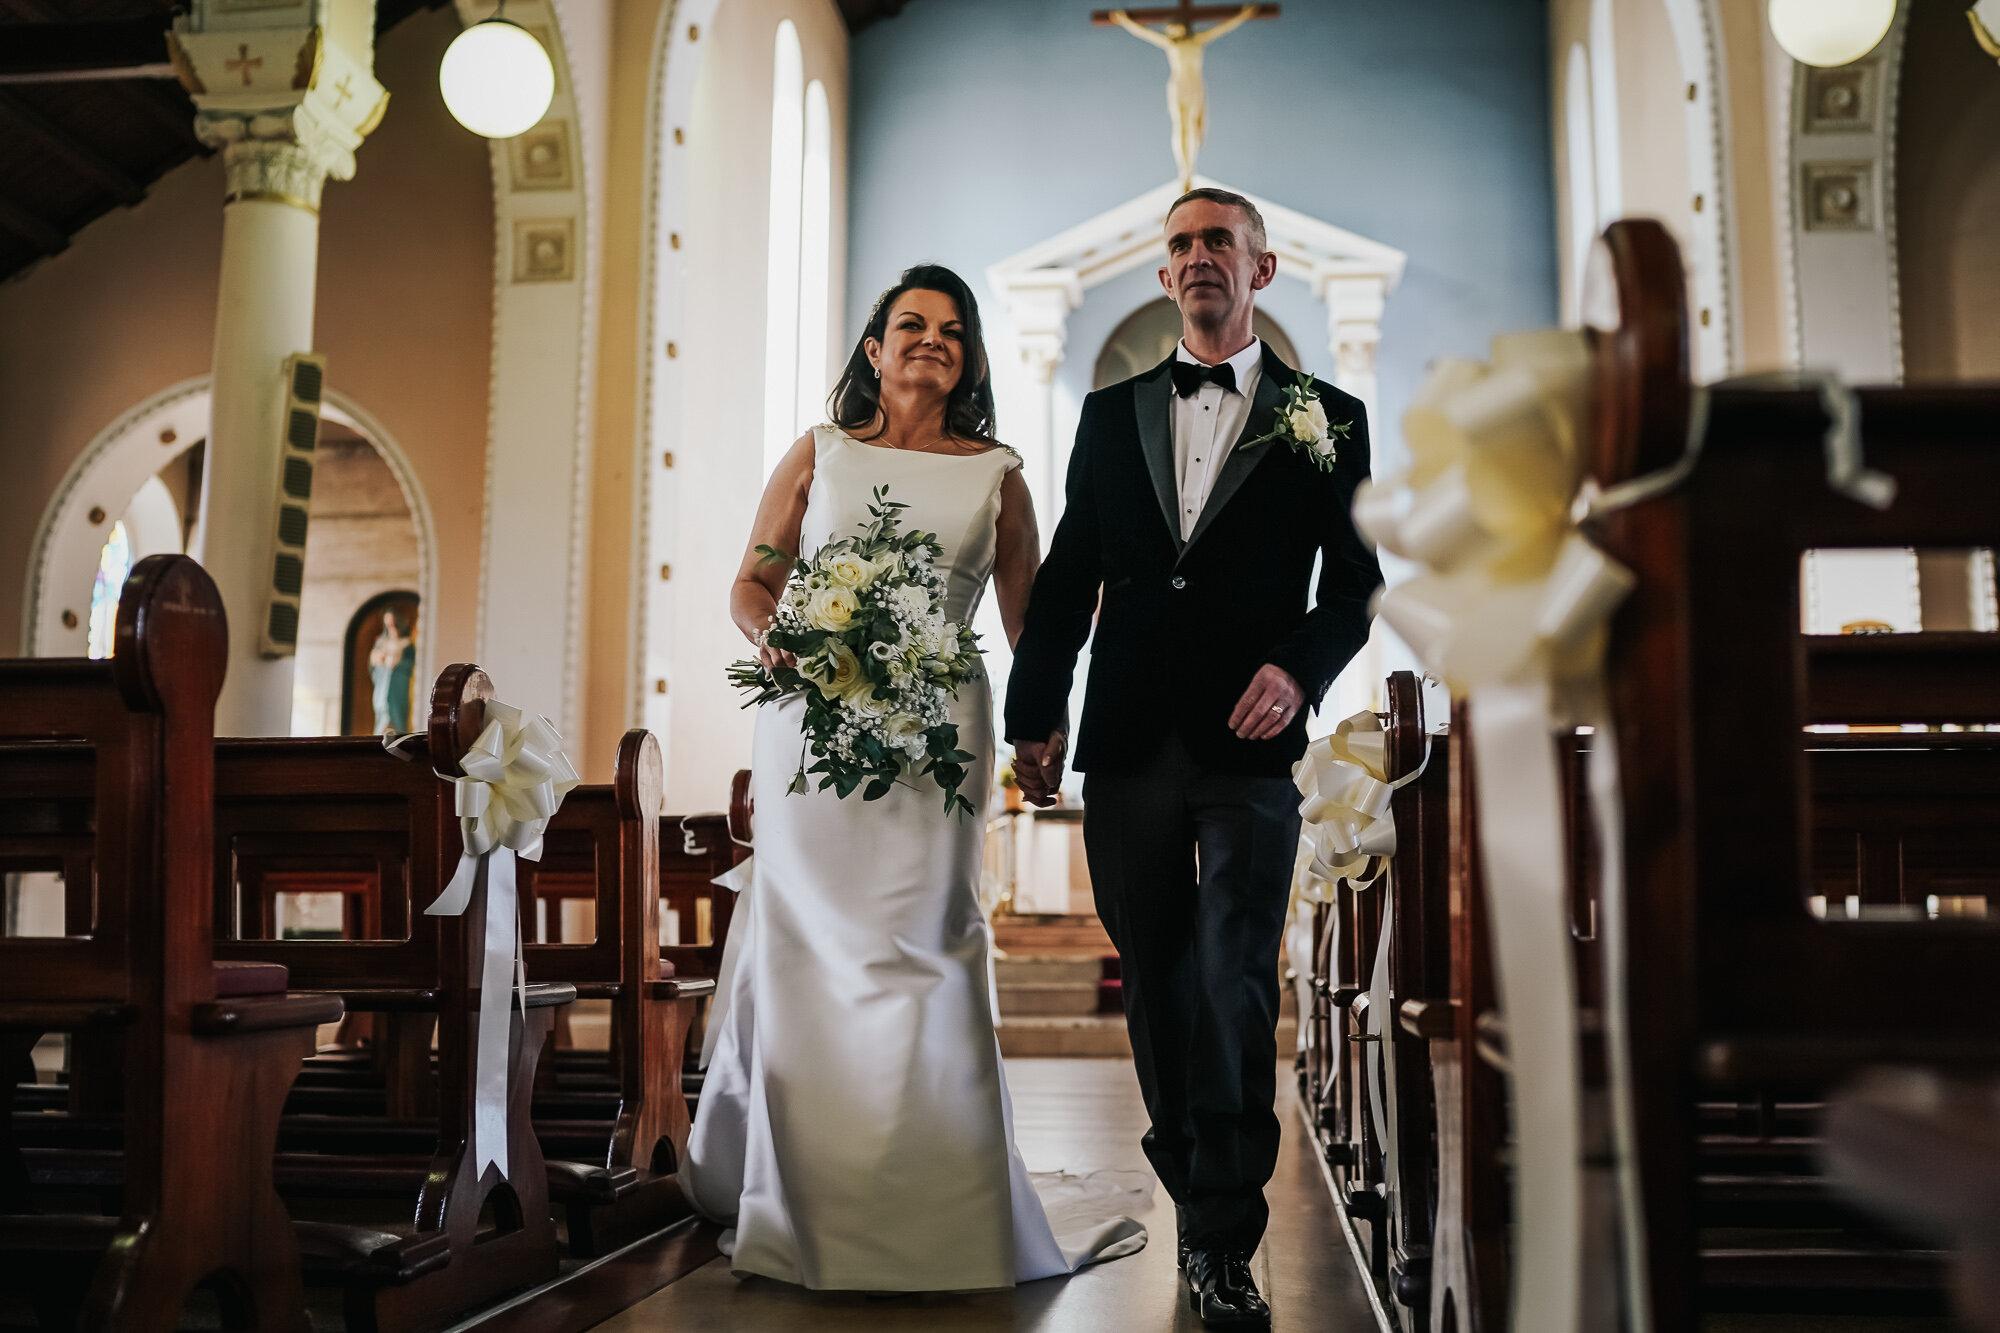 Clontarf Caste wedding photographer Wedding Photography dublin ireland wedding photographer (31 of 58).jpg